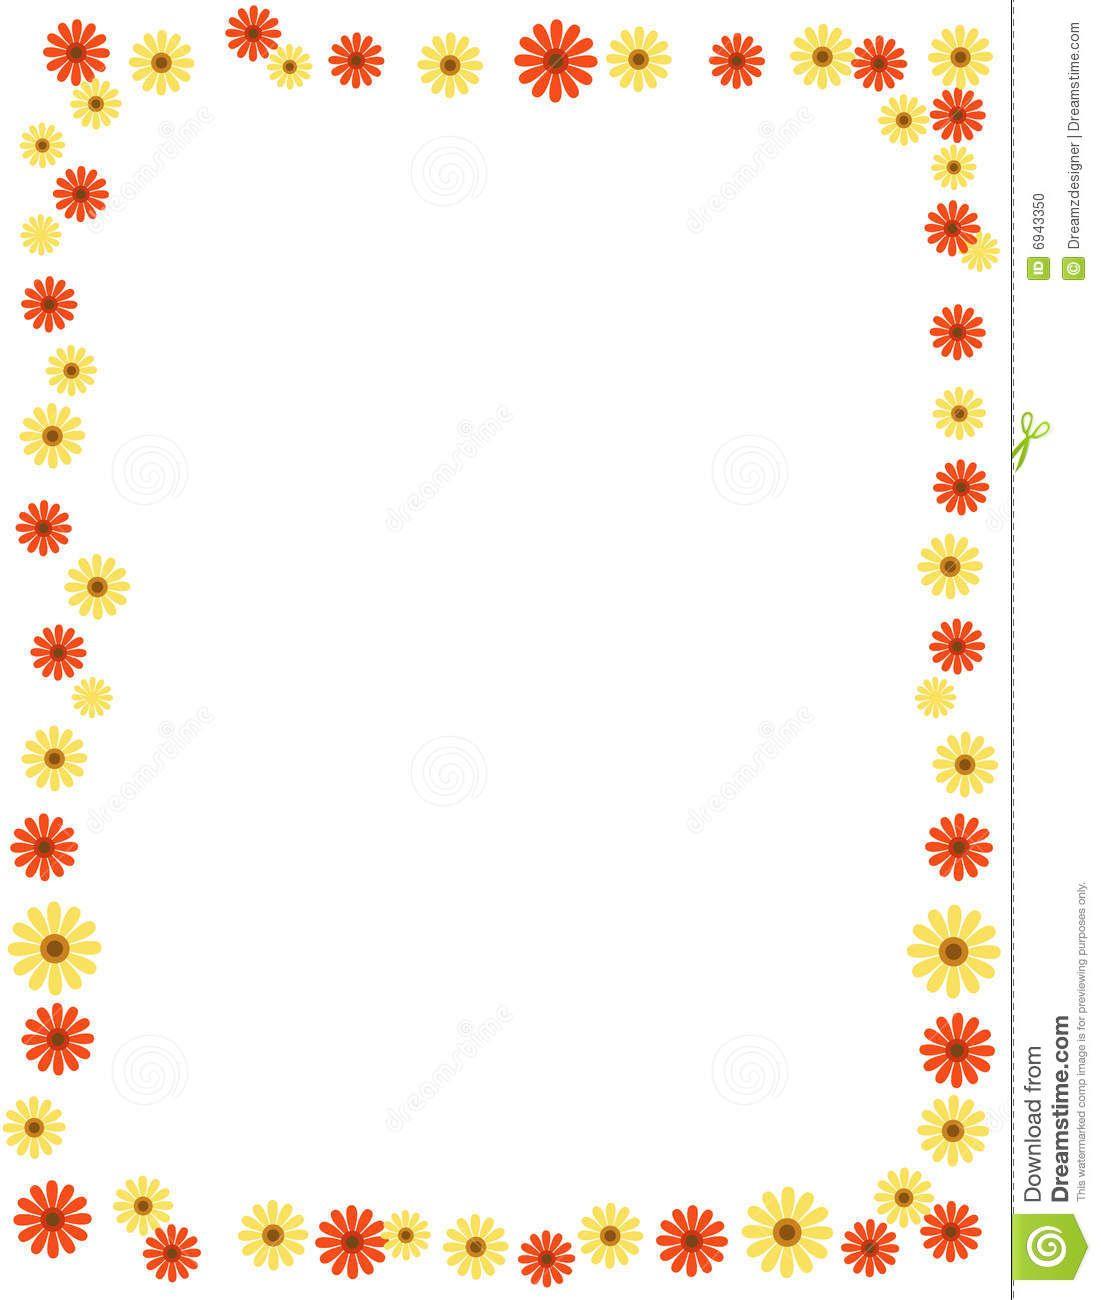 Daisy border clipart clip art library download daisy border clip art | papre 3 | Illustration, Clip art, Daisy clip art library download